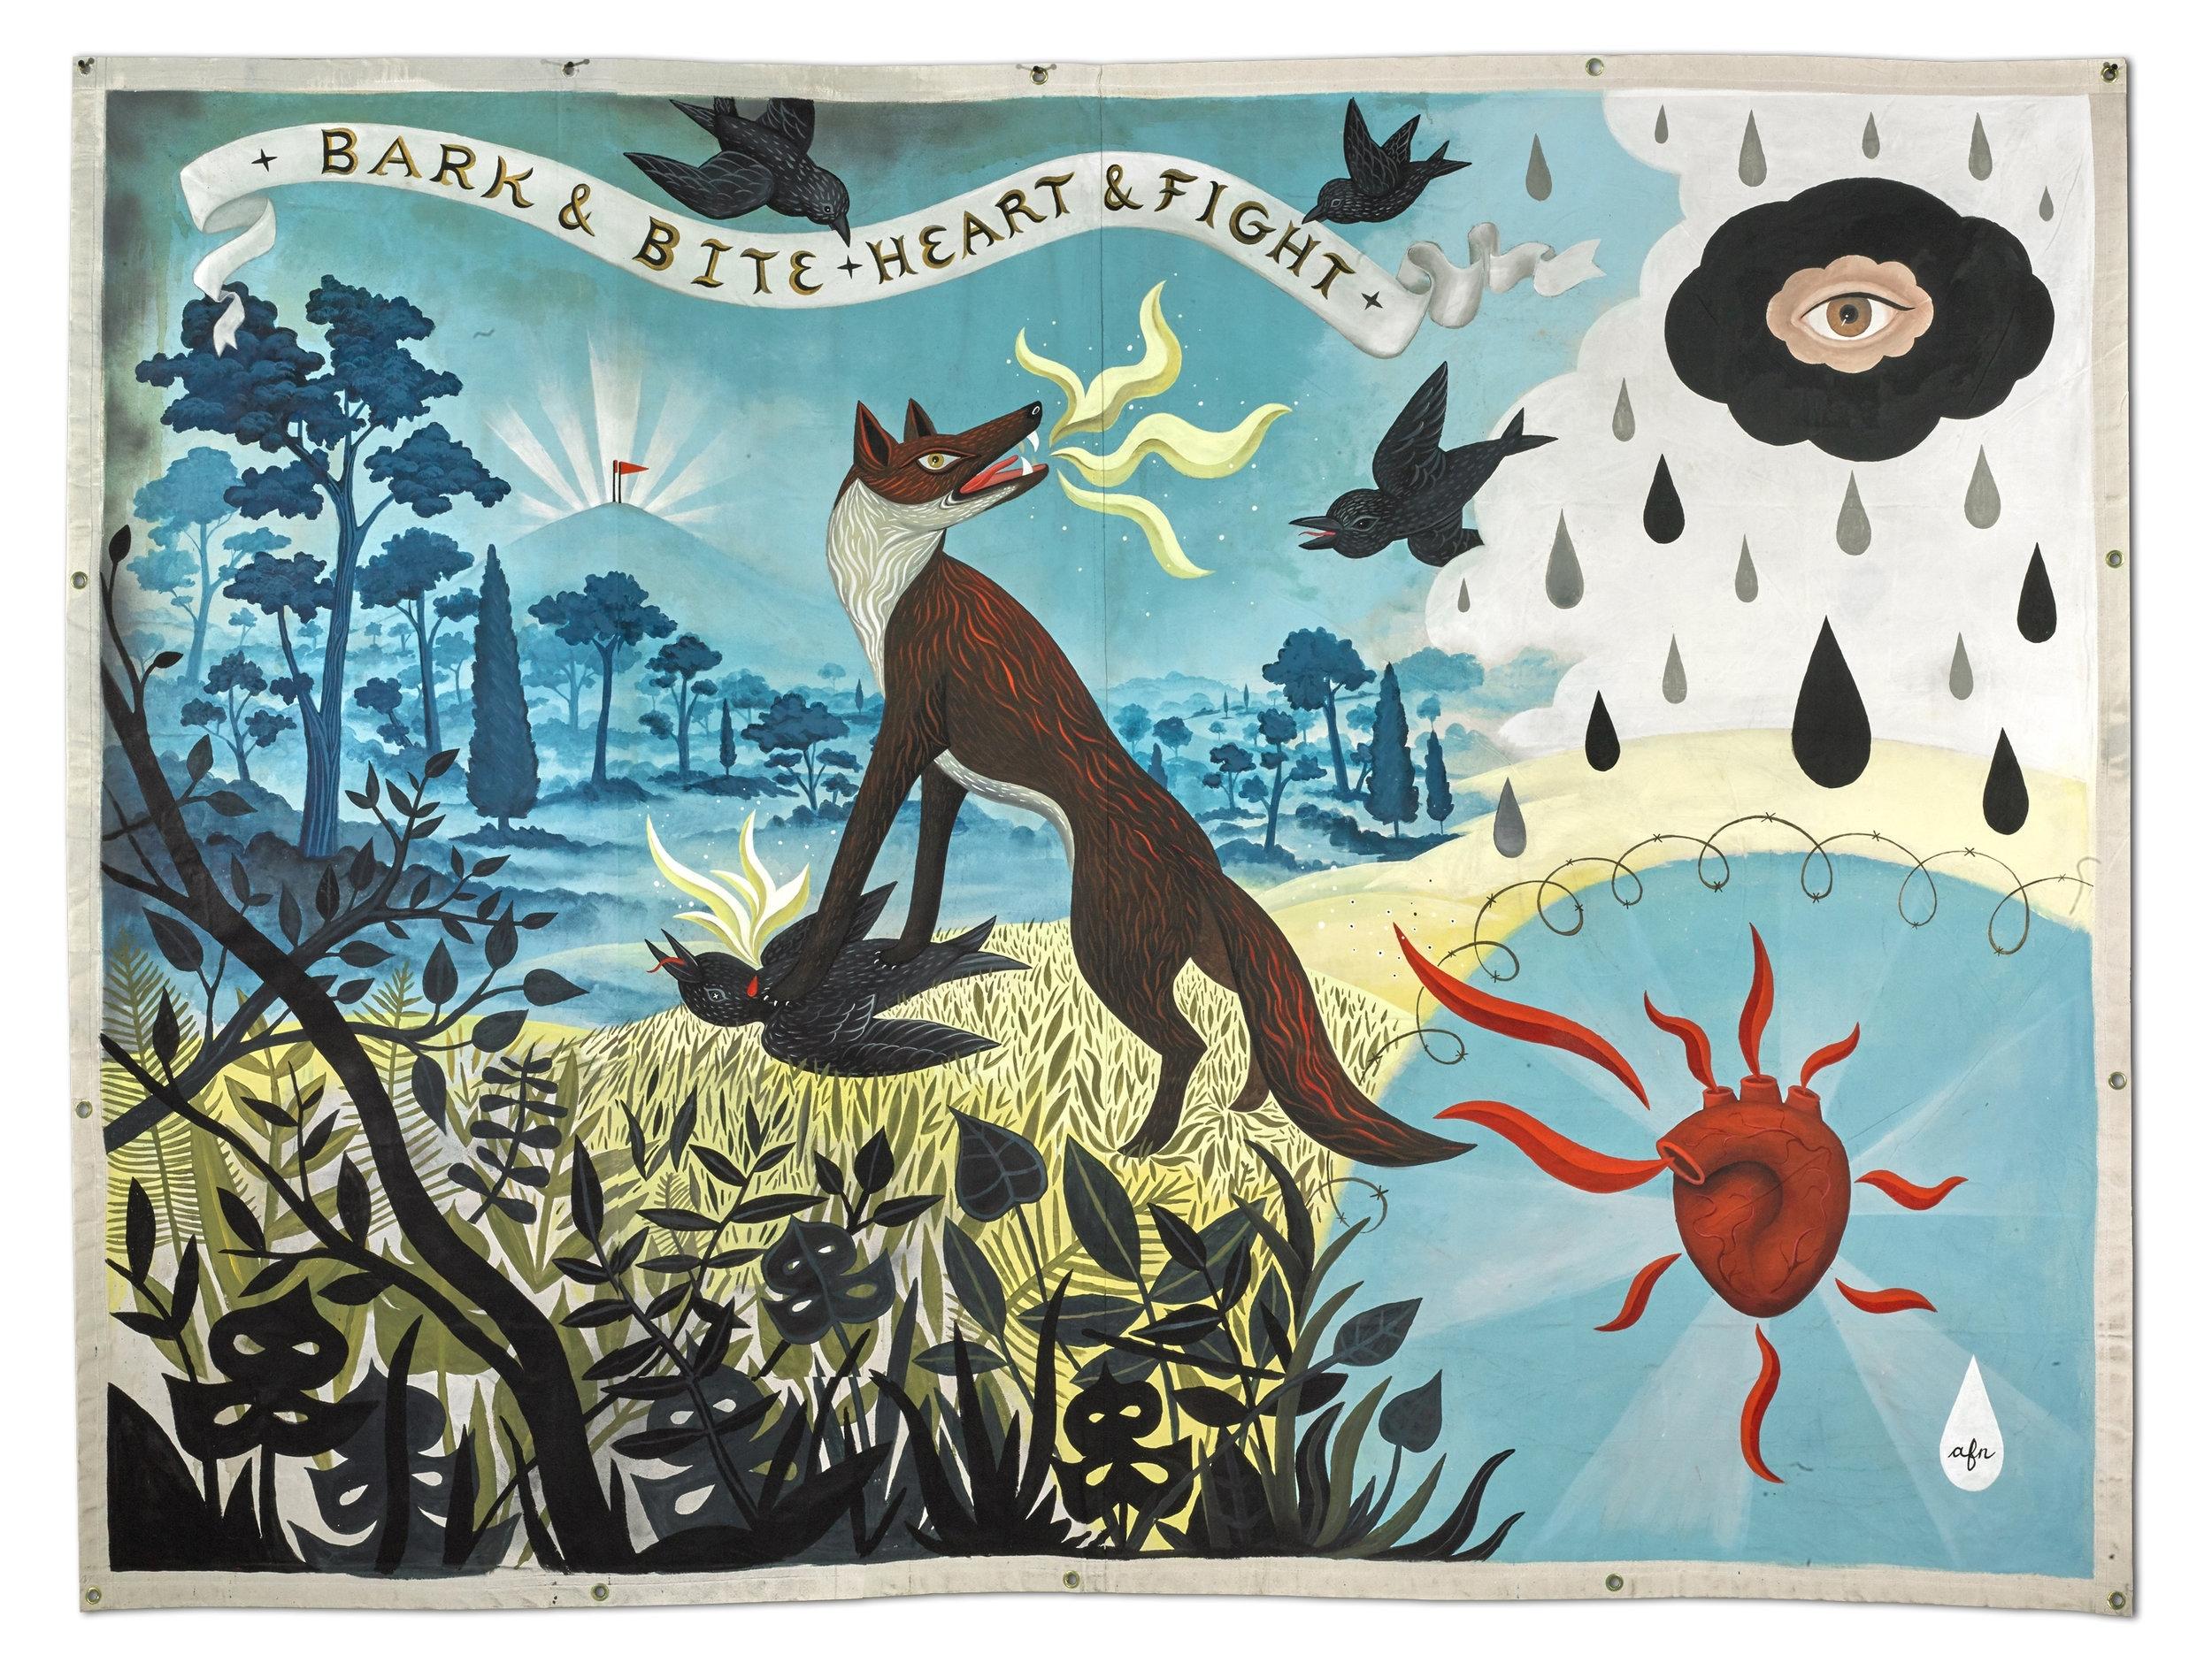 "Bark & Bite, Heart & Fight   by Anne Faith Nicholls, 2017.Approx.105"" x 79"",acrylic on custom-made grommeted canvas"